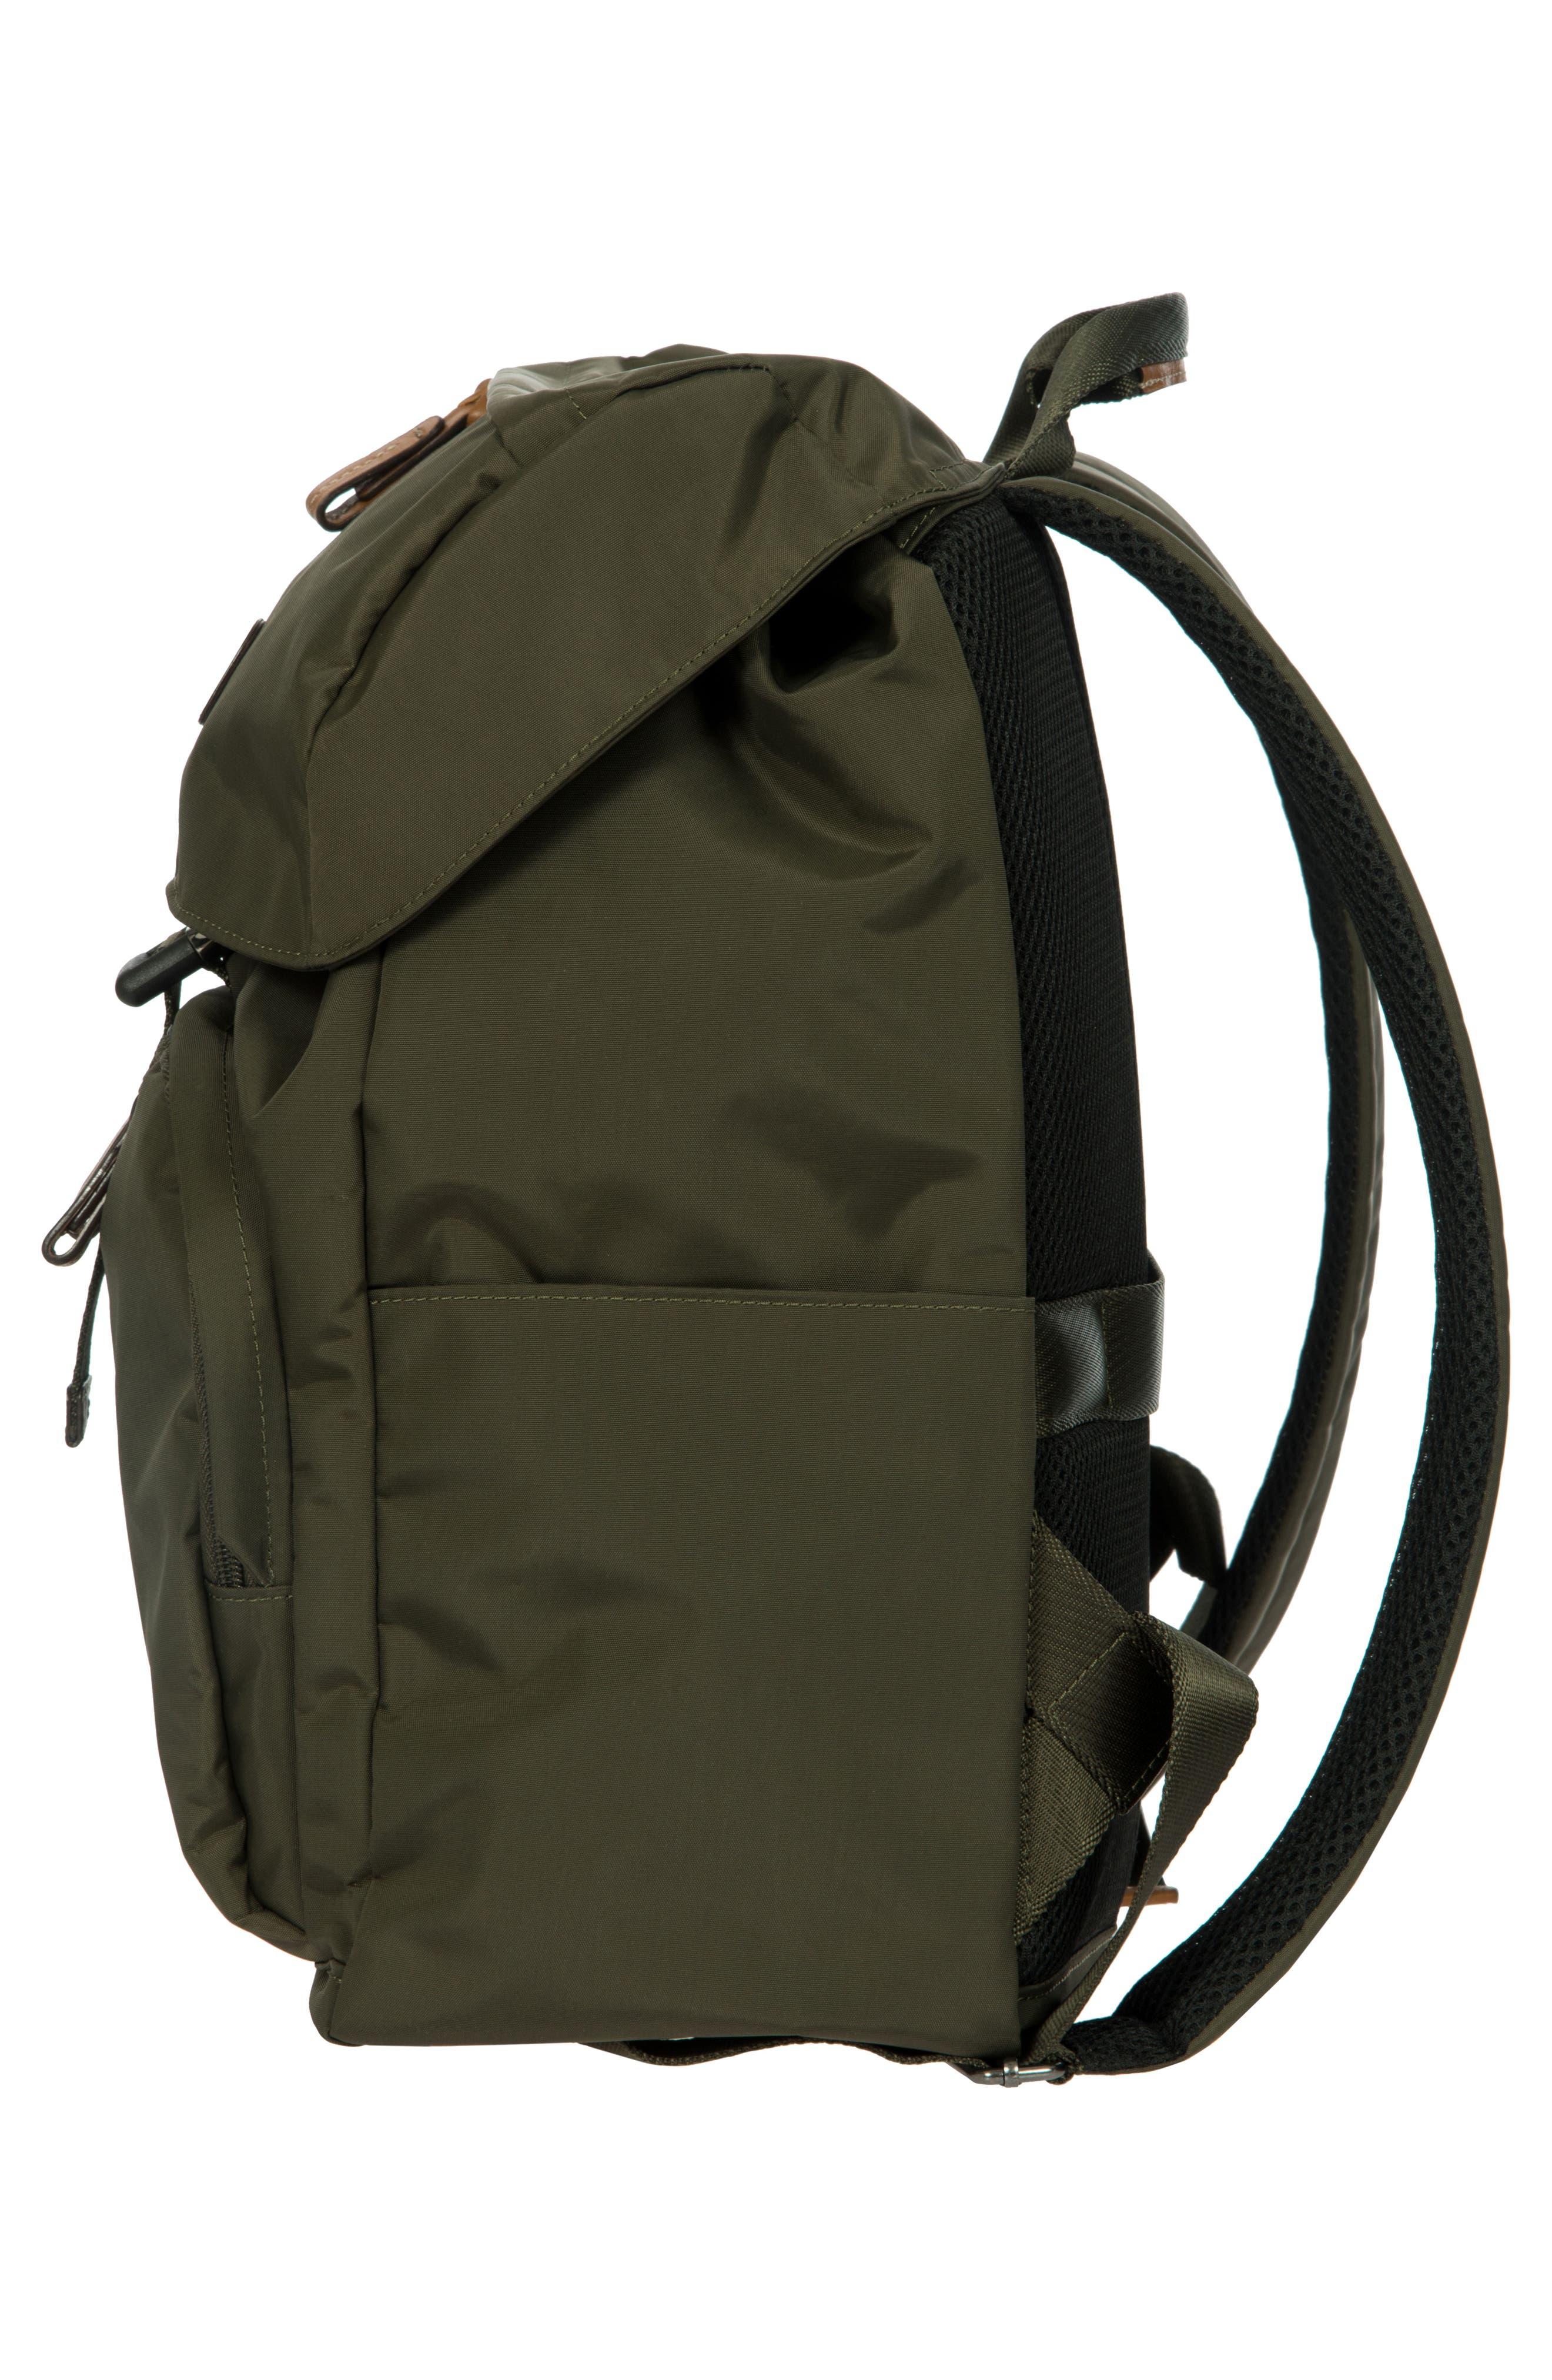 X-Bag Travel Excursion Backpack,                             Alternate thumbnail 4, color,                             Olive